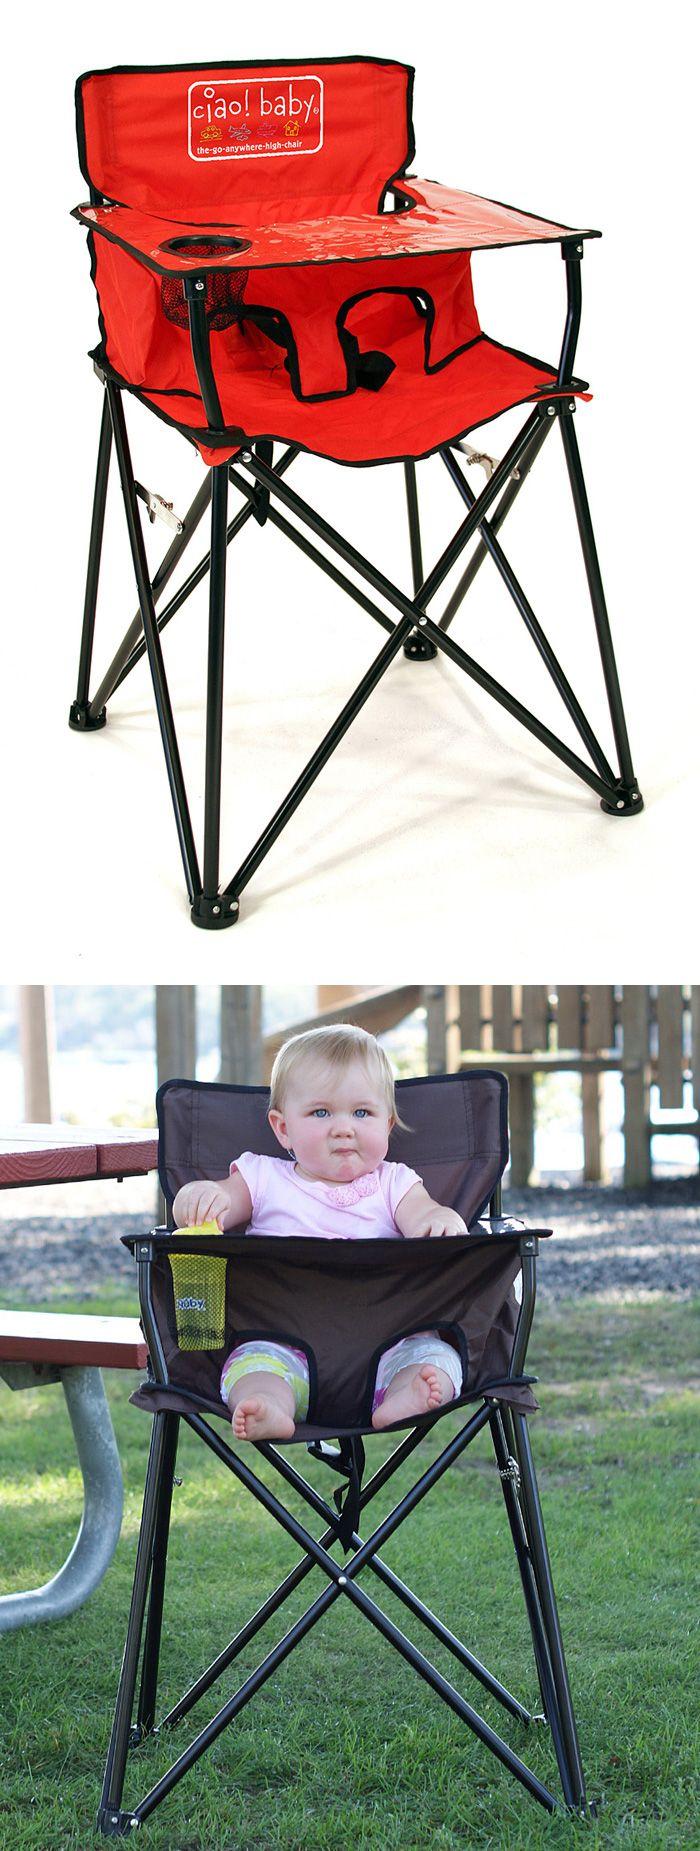 Baby Portable Travel High Chair Genius Baby Baby Kids